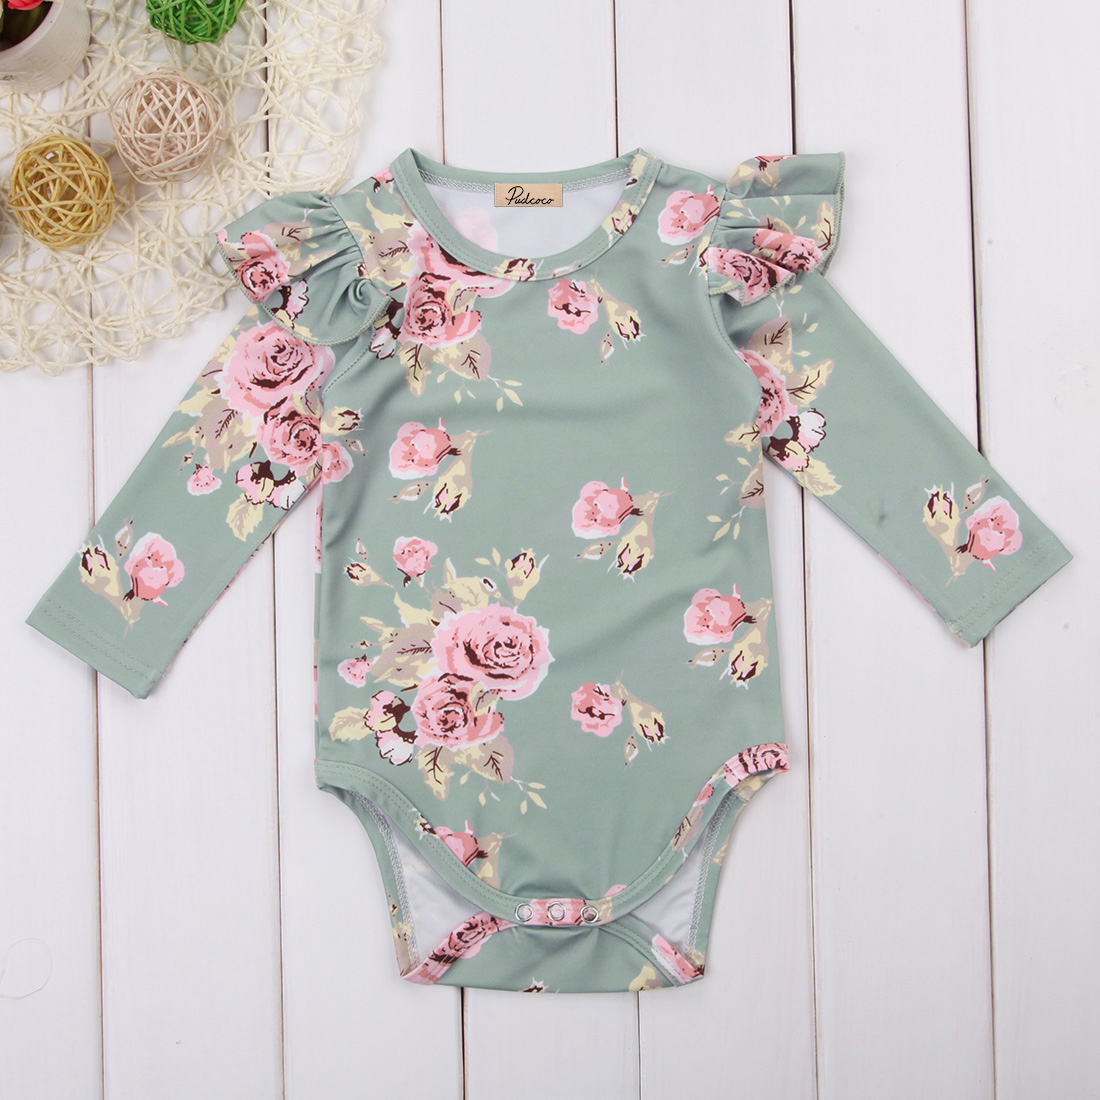 fdebfd5dc240 Newborn Baby Girl Clothing Floral Romper Kids Long Sleeve Cute ...